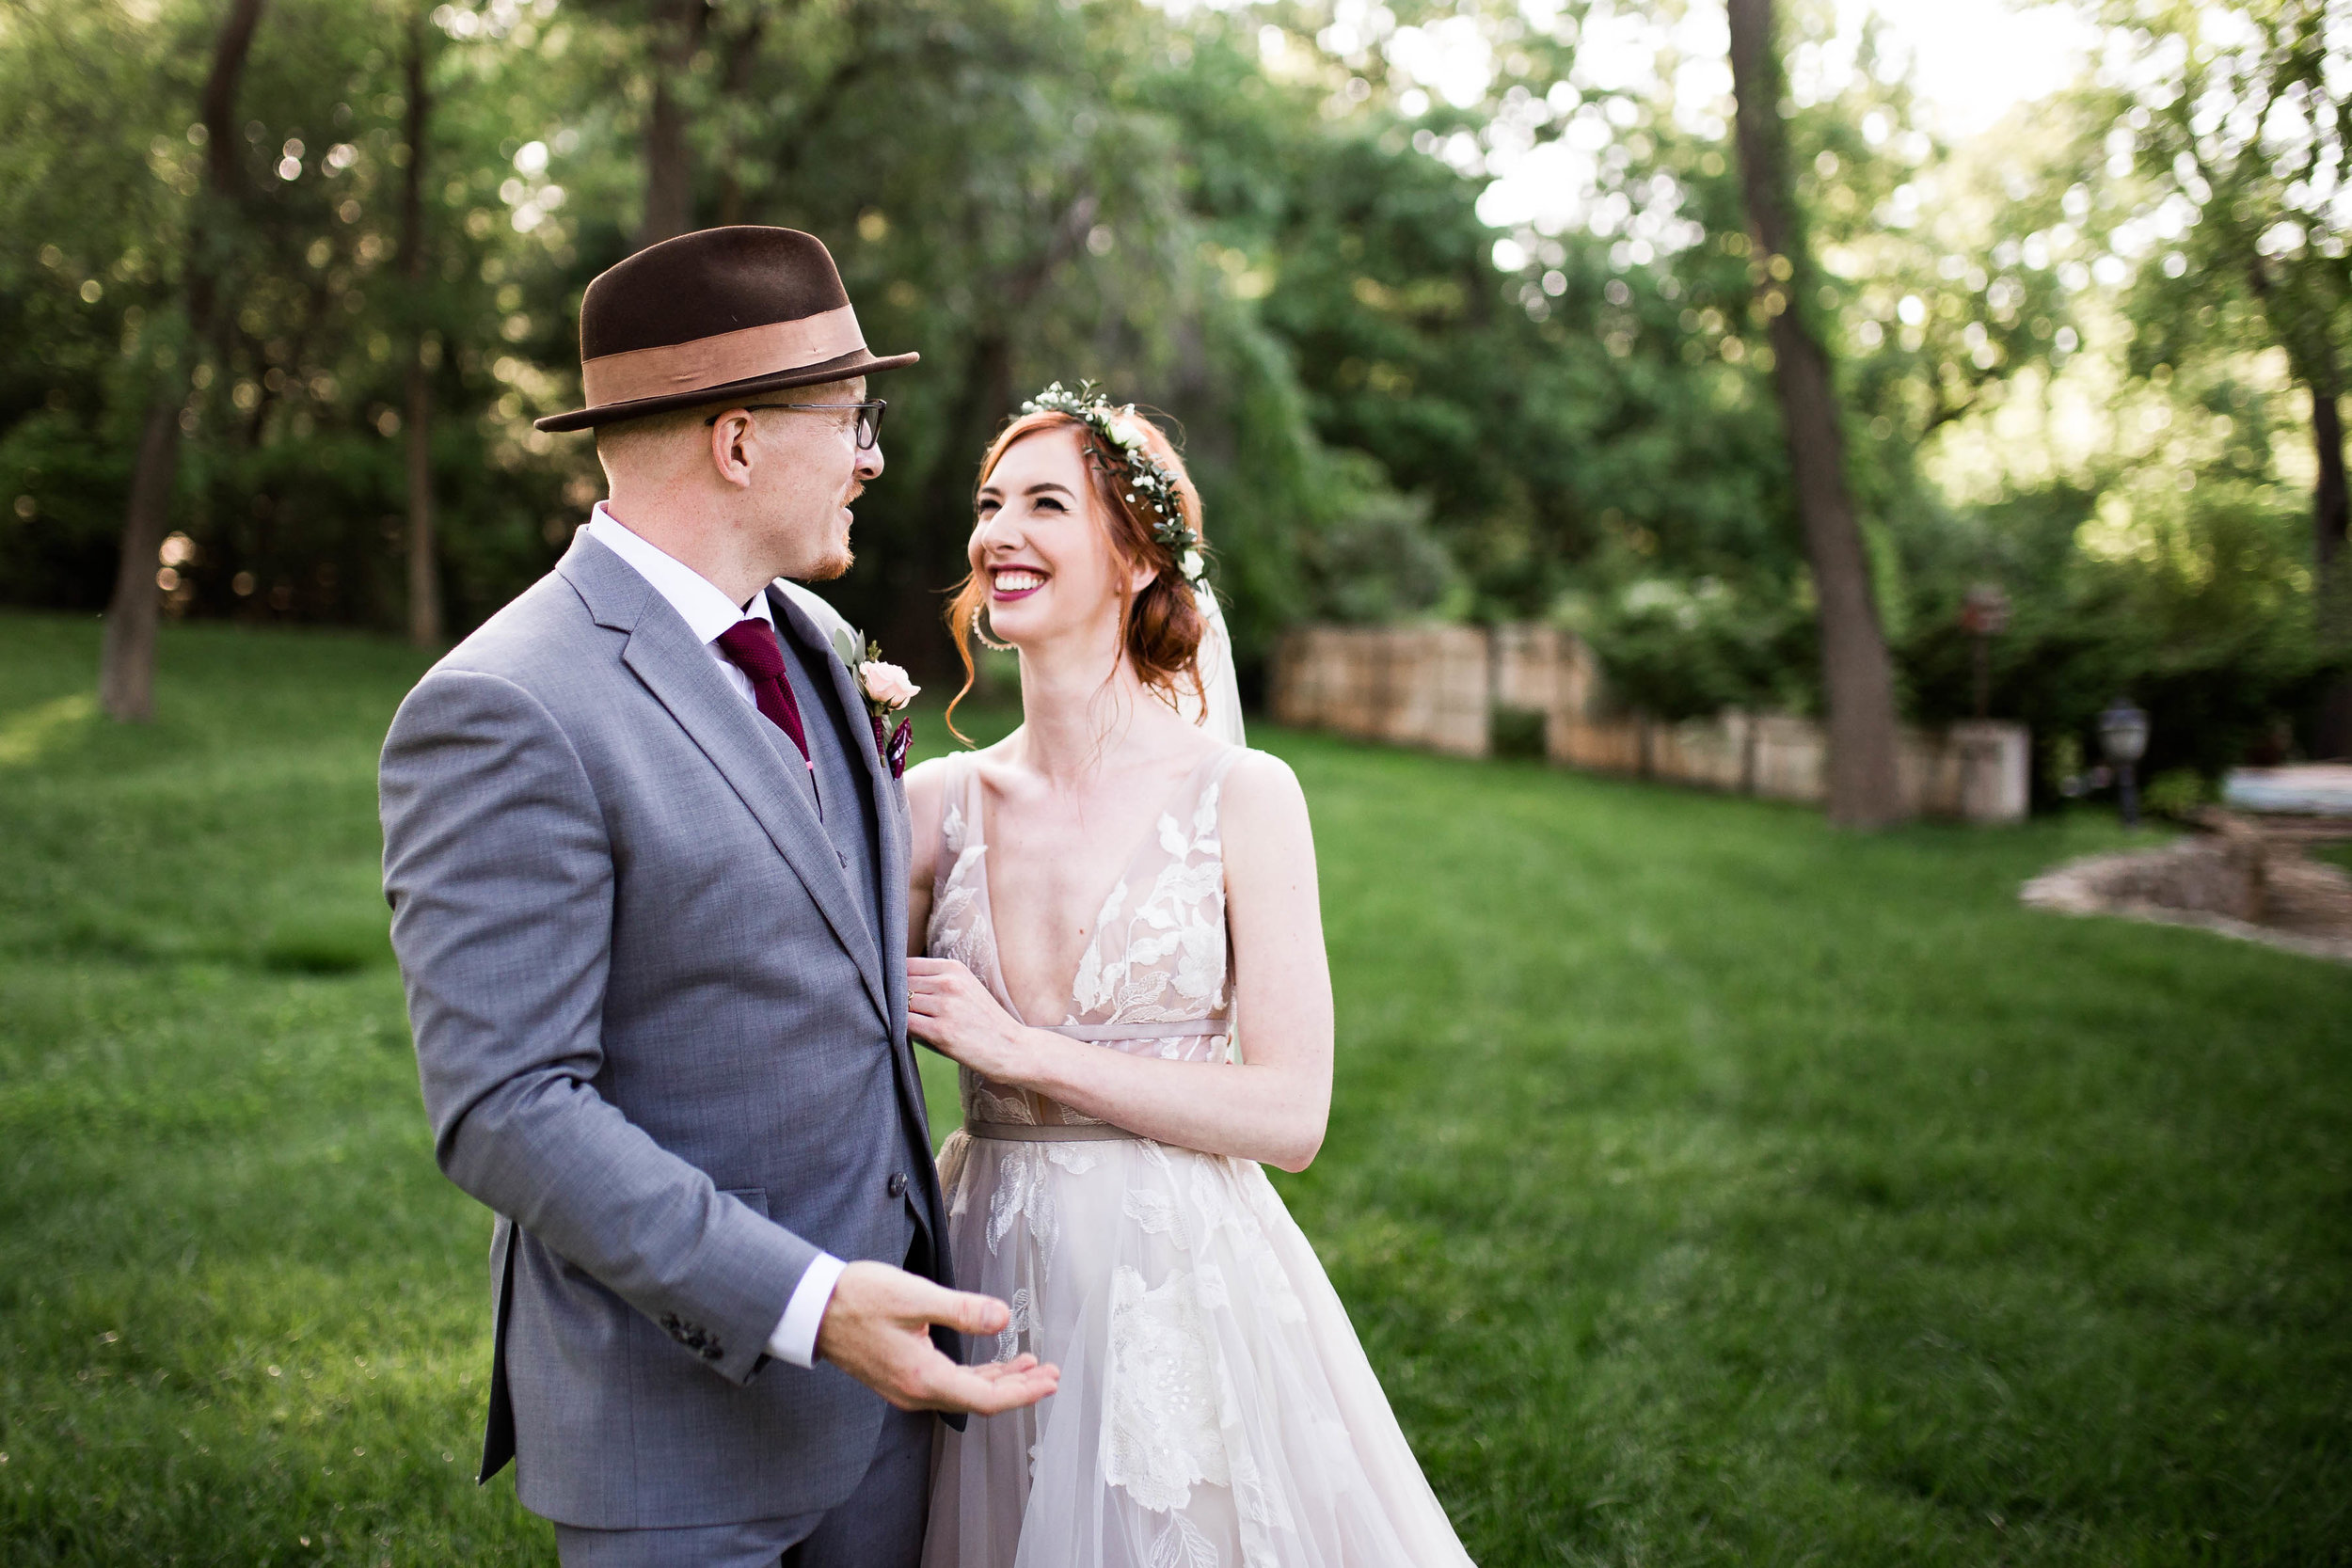 armstrong-wedding-558.jpg